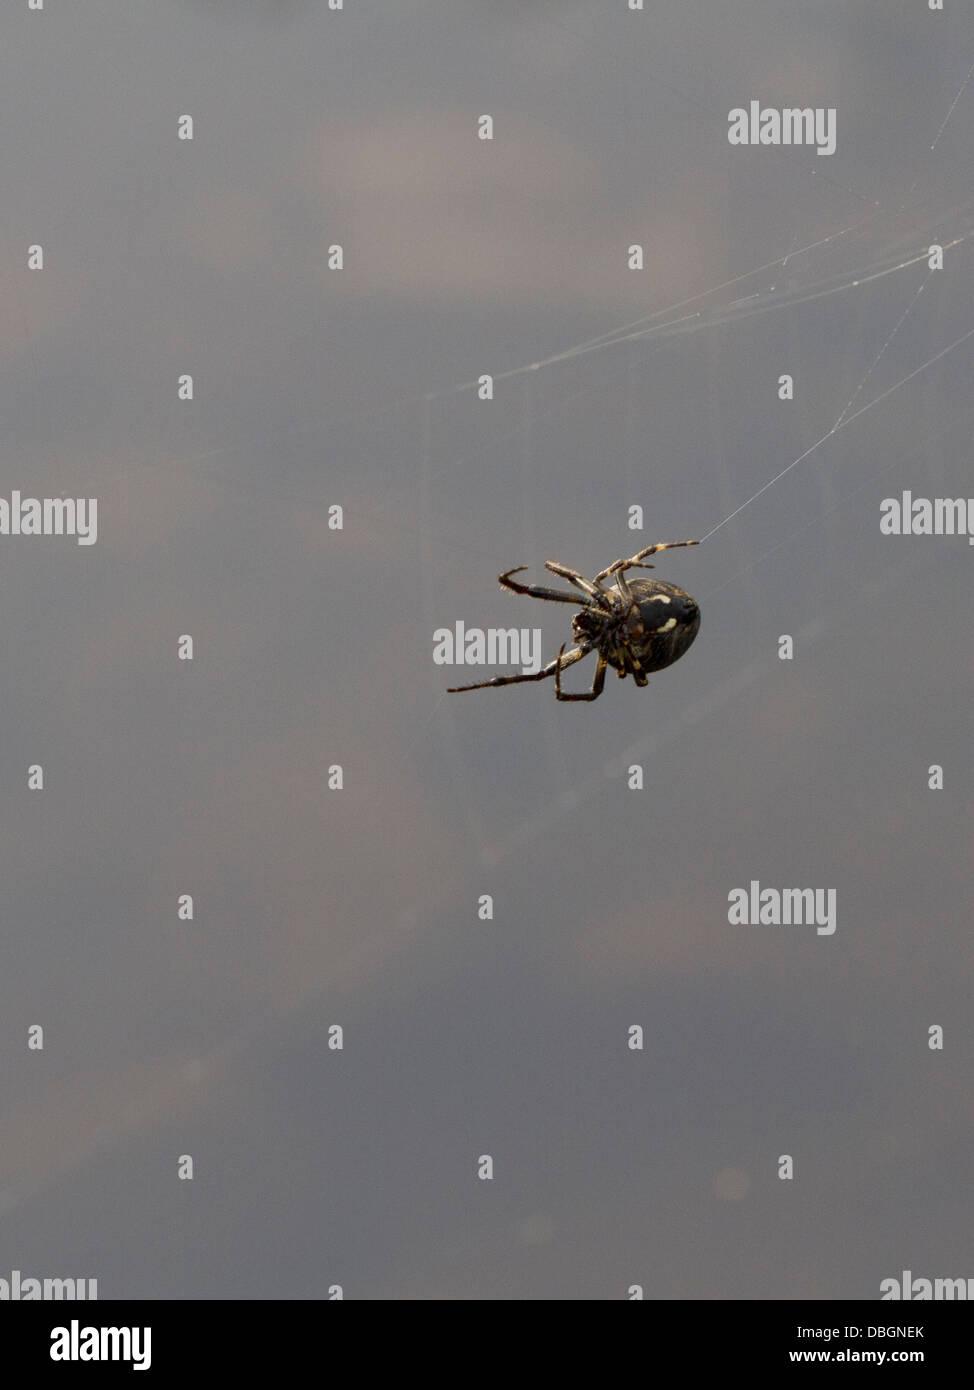 Walnut Orb Weaver Spider repairing web - Stock Image